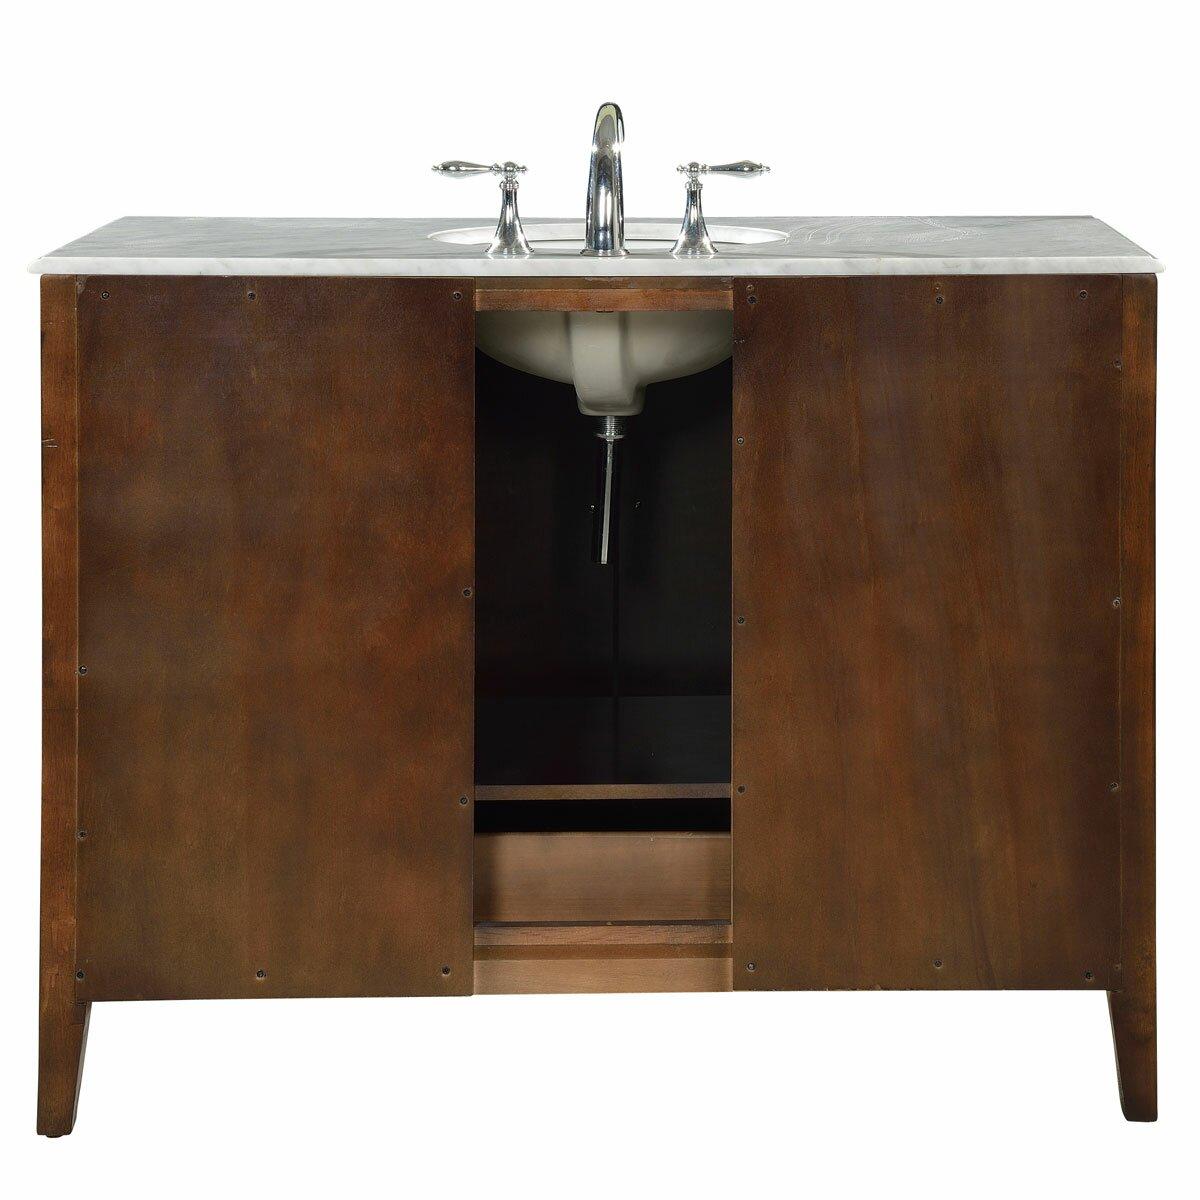 Bathroom single sink cabinets - Silkroad Exclusive 48 Quot Single Sink Cabinet Bathroom Vanity Set